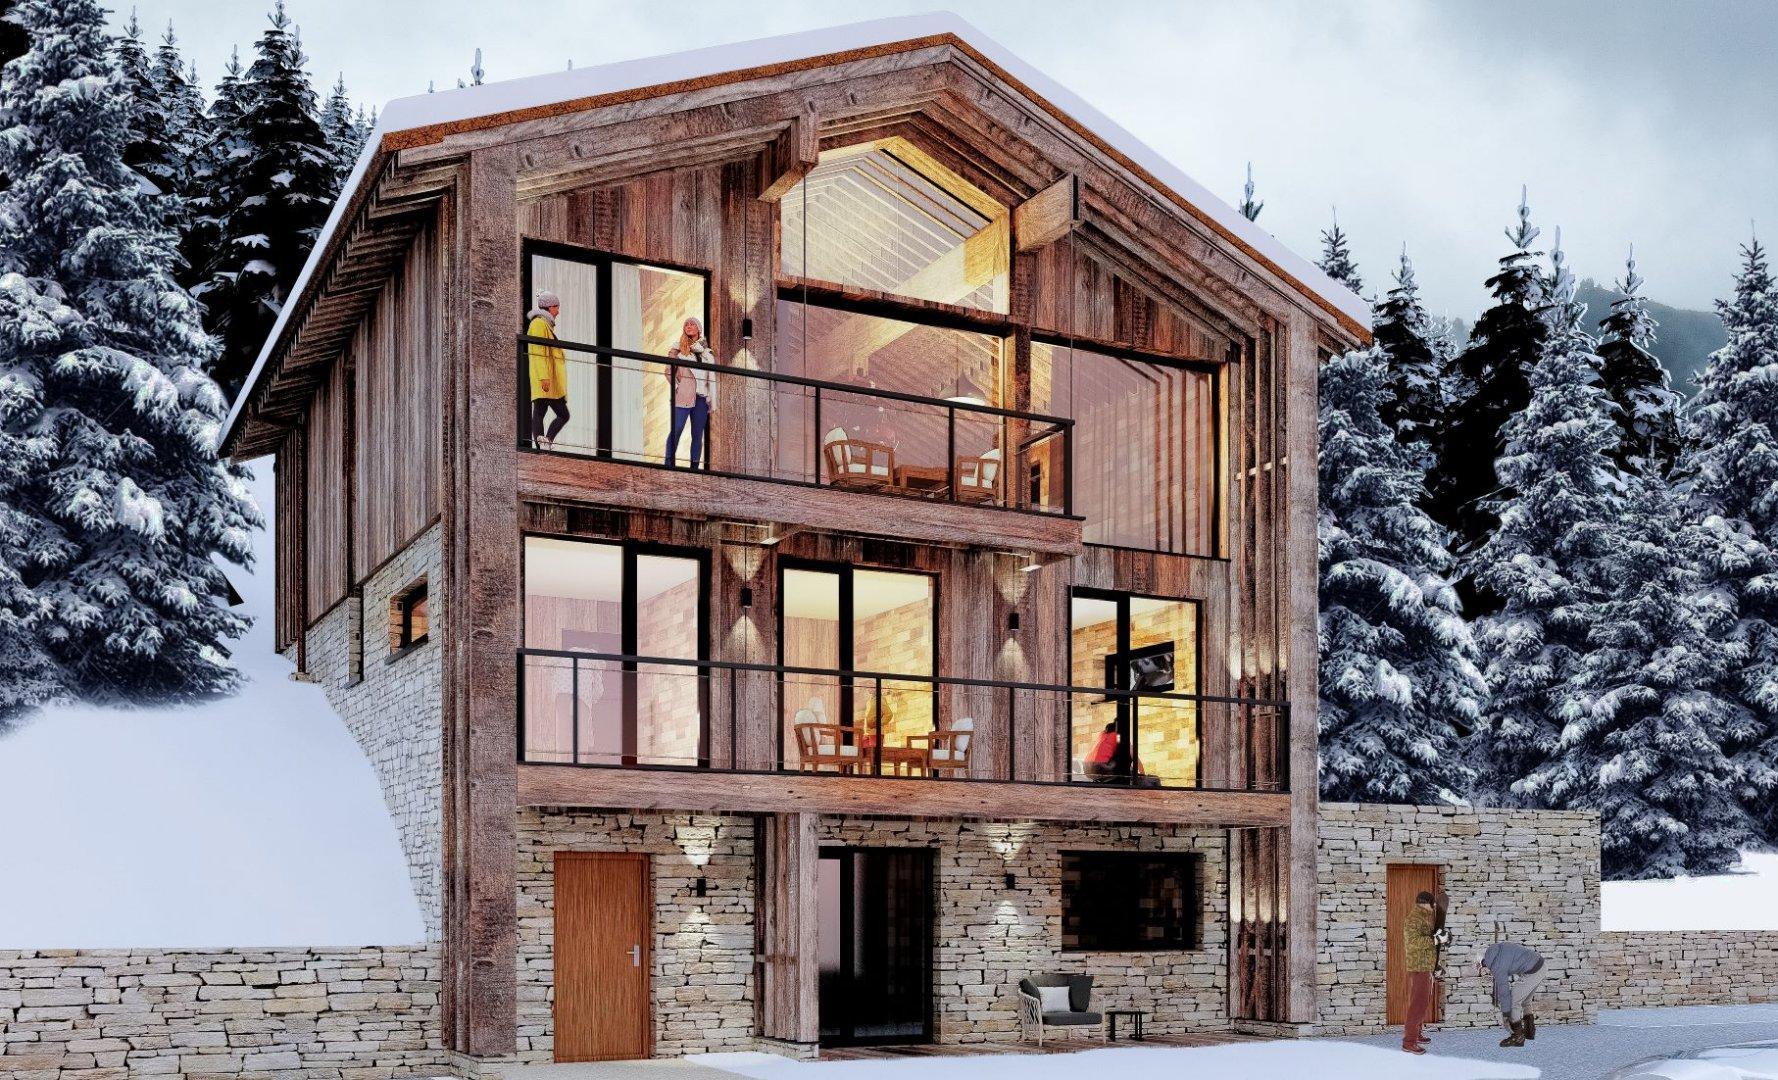 La Plagne accommodation chalets for sale in La Plagne apartments to buy in La Plagne holiday homes to buy in La Plagne